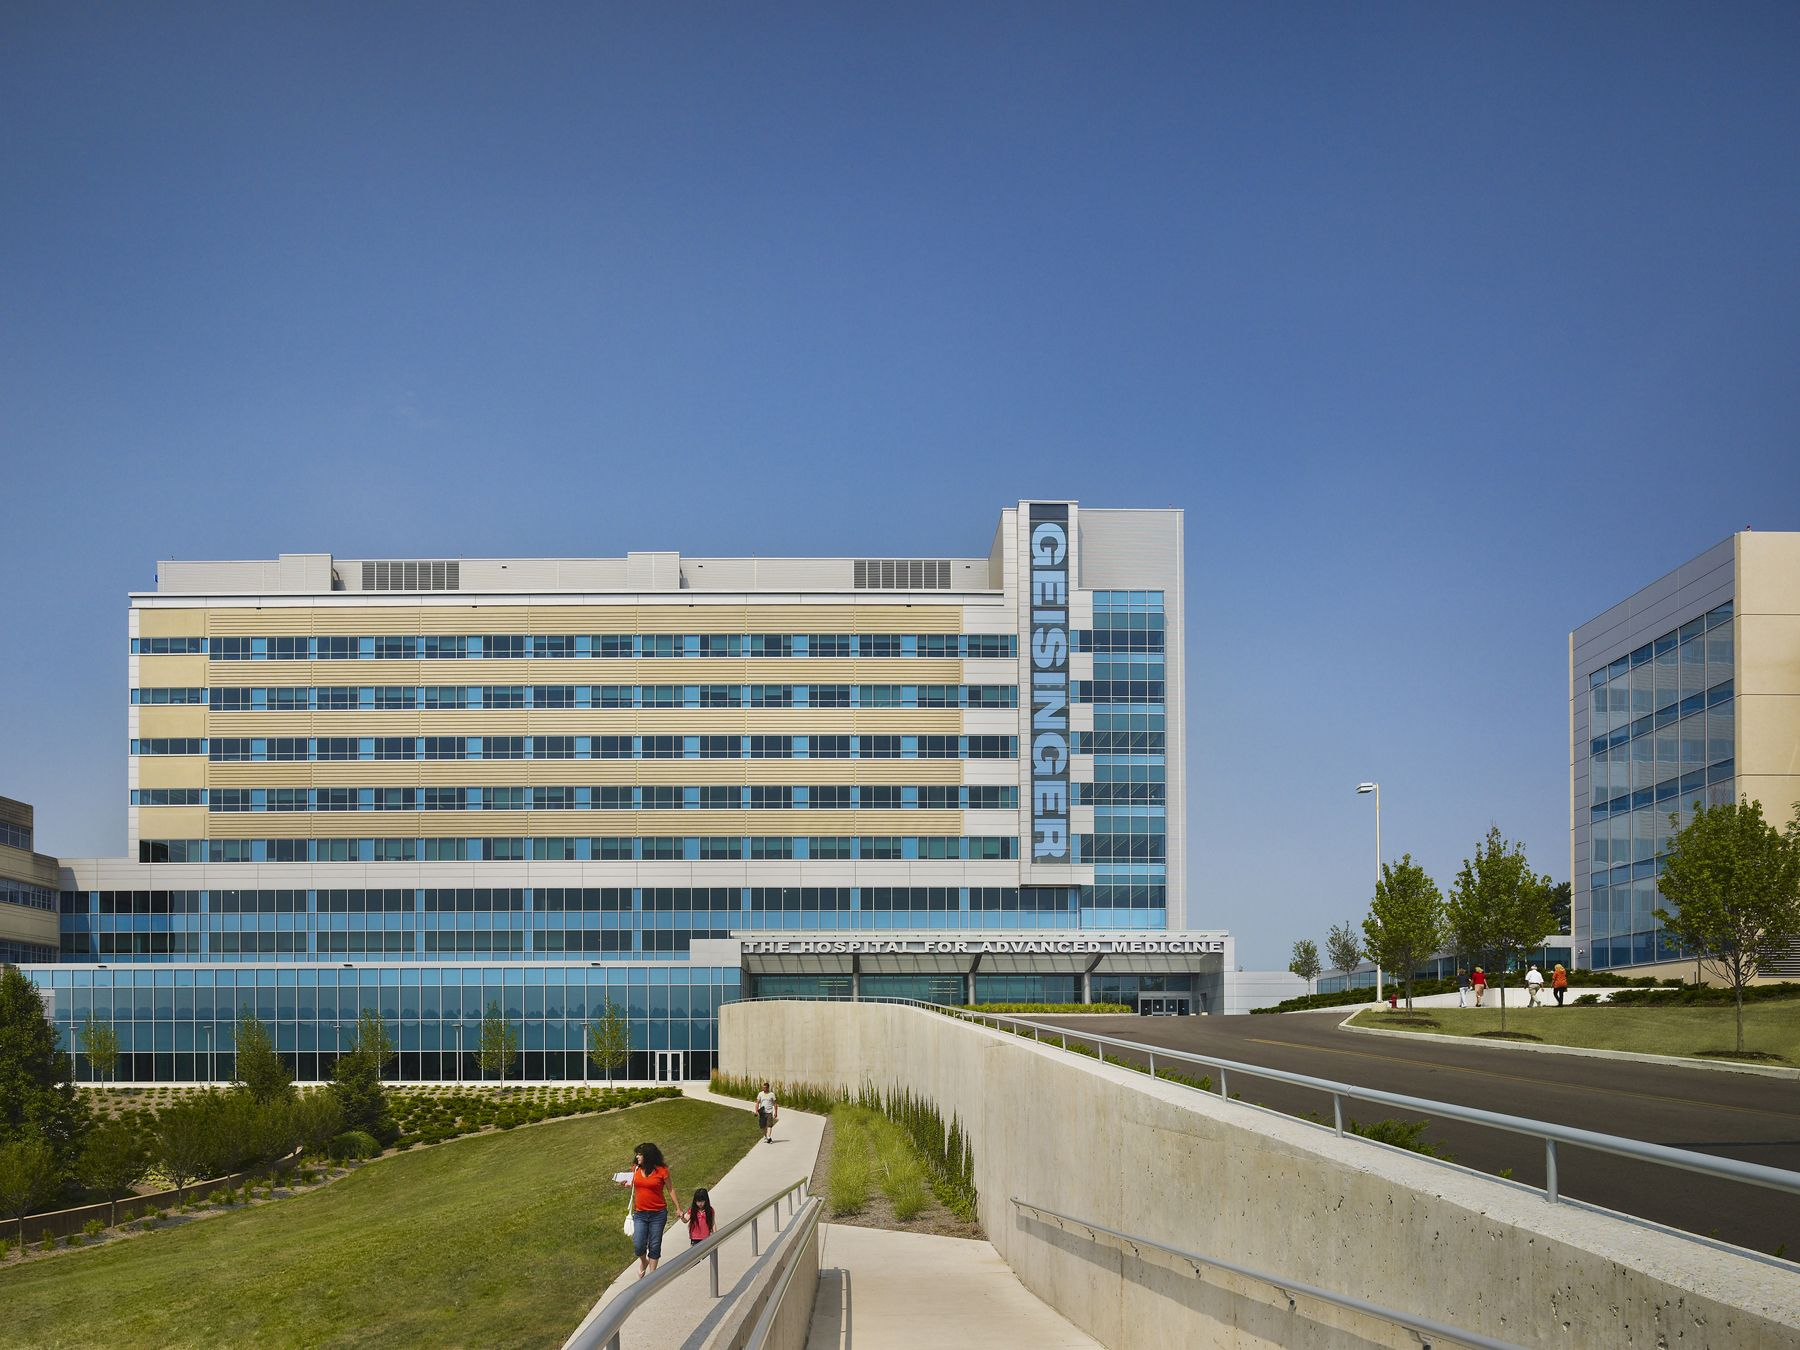 Geisinger health system health system health system